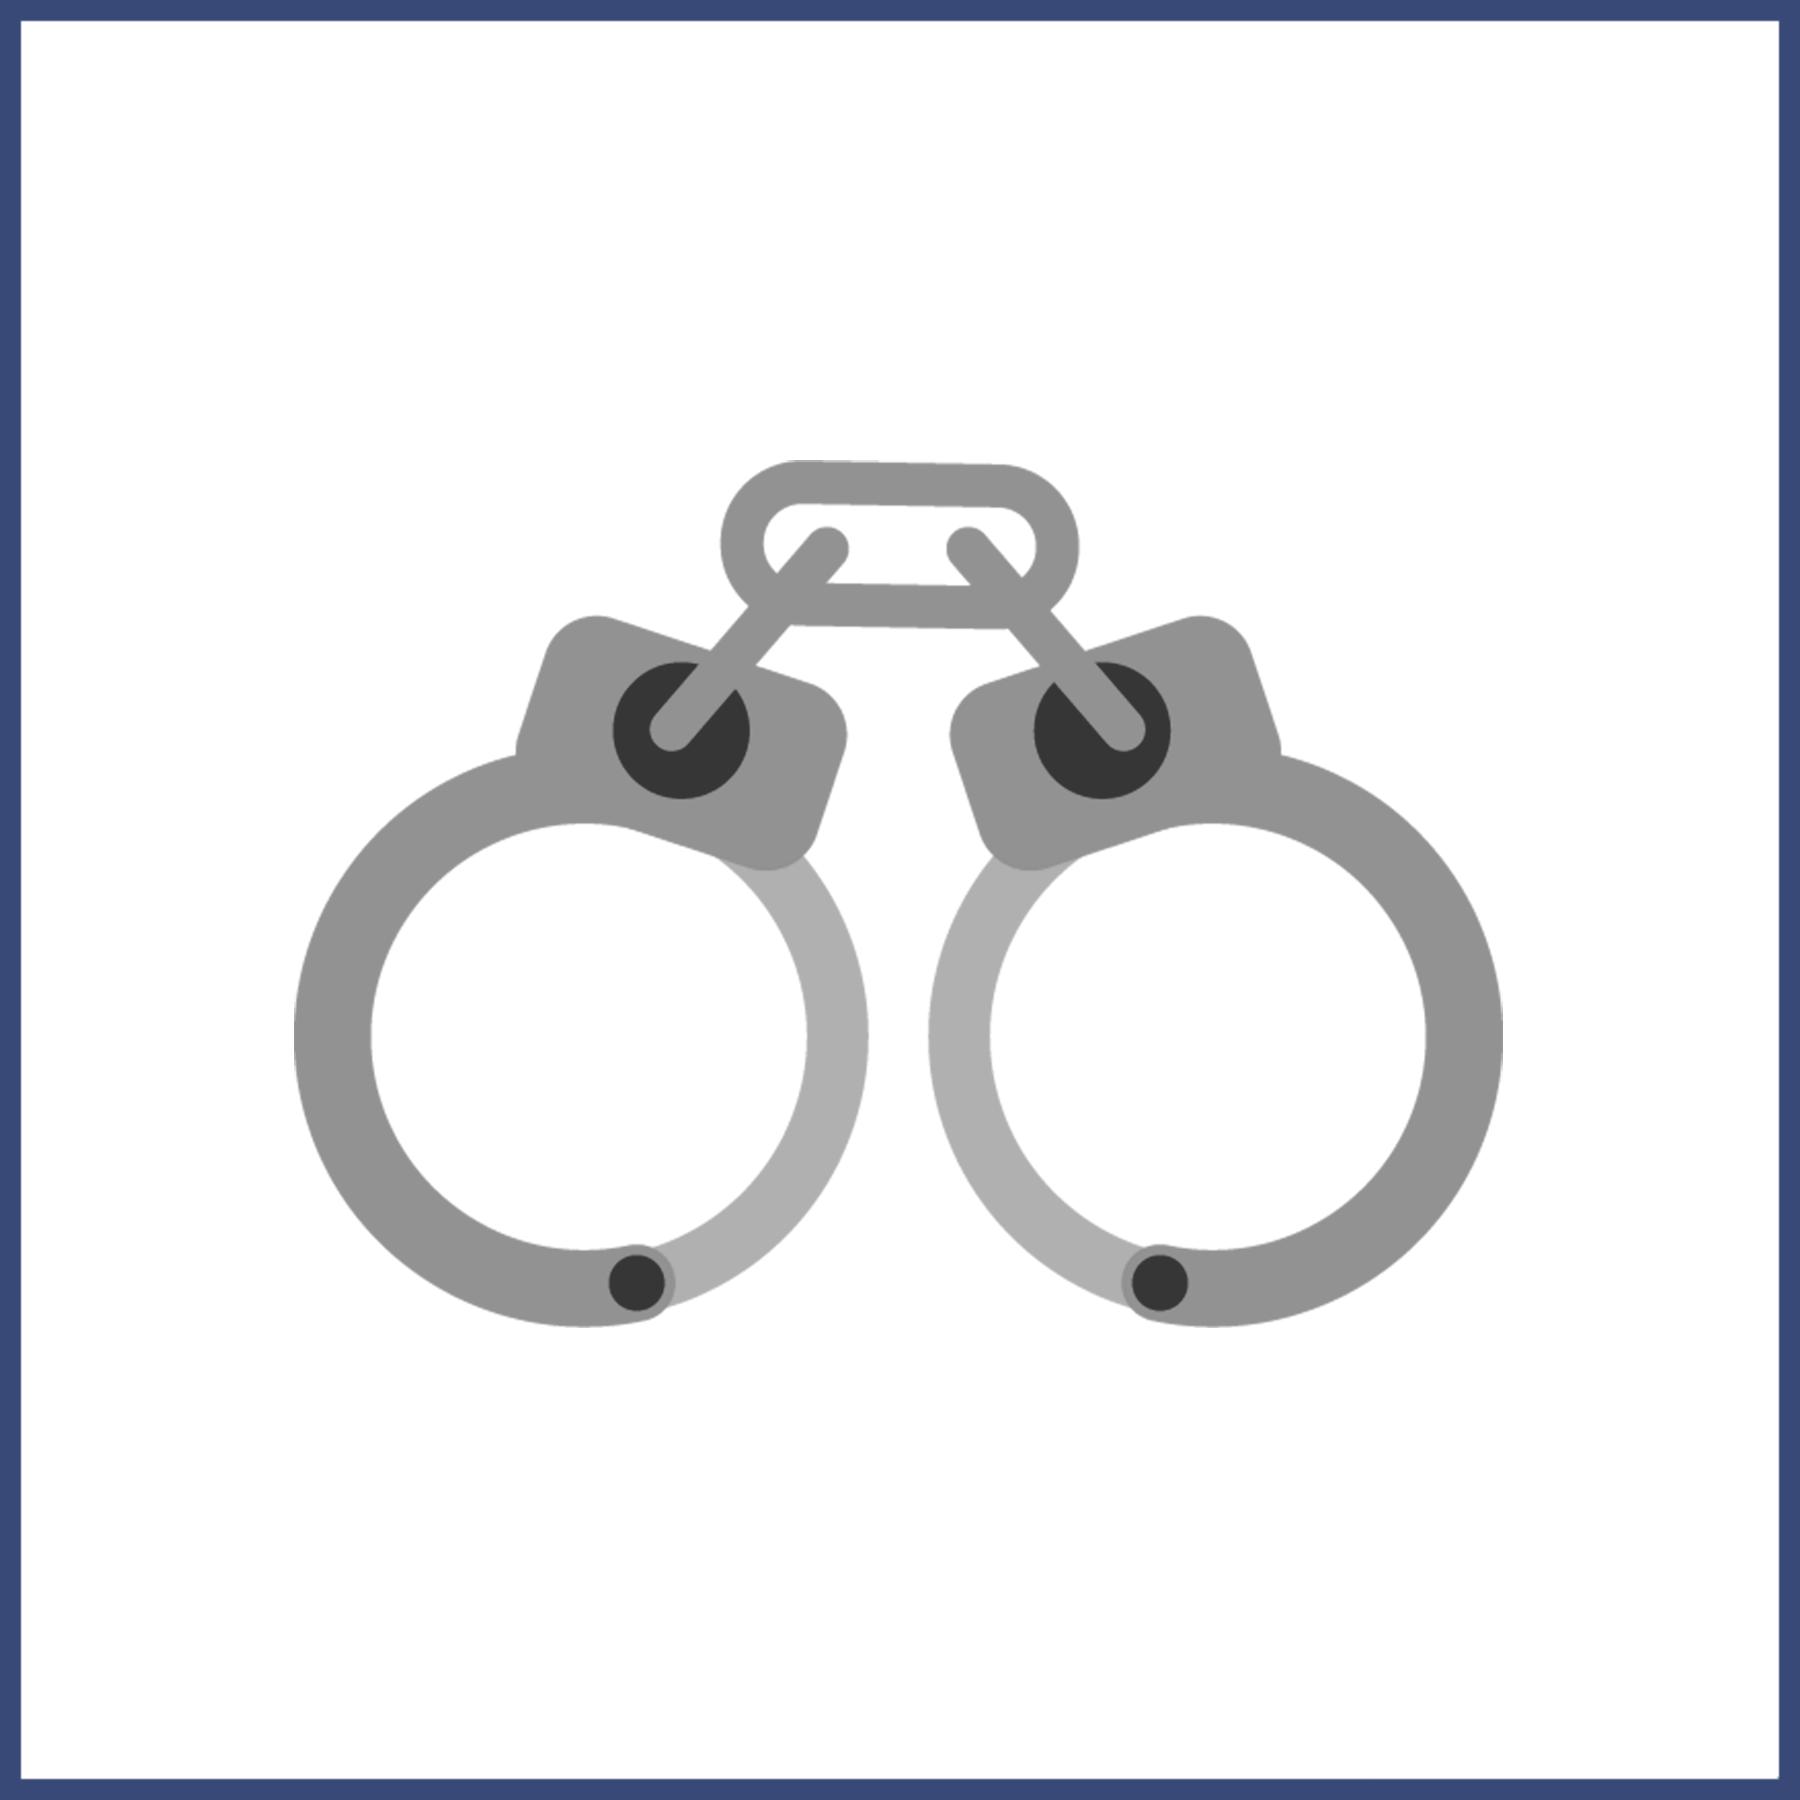 AA current dk blu thin - grey cuffs.png